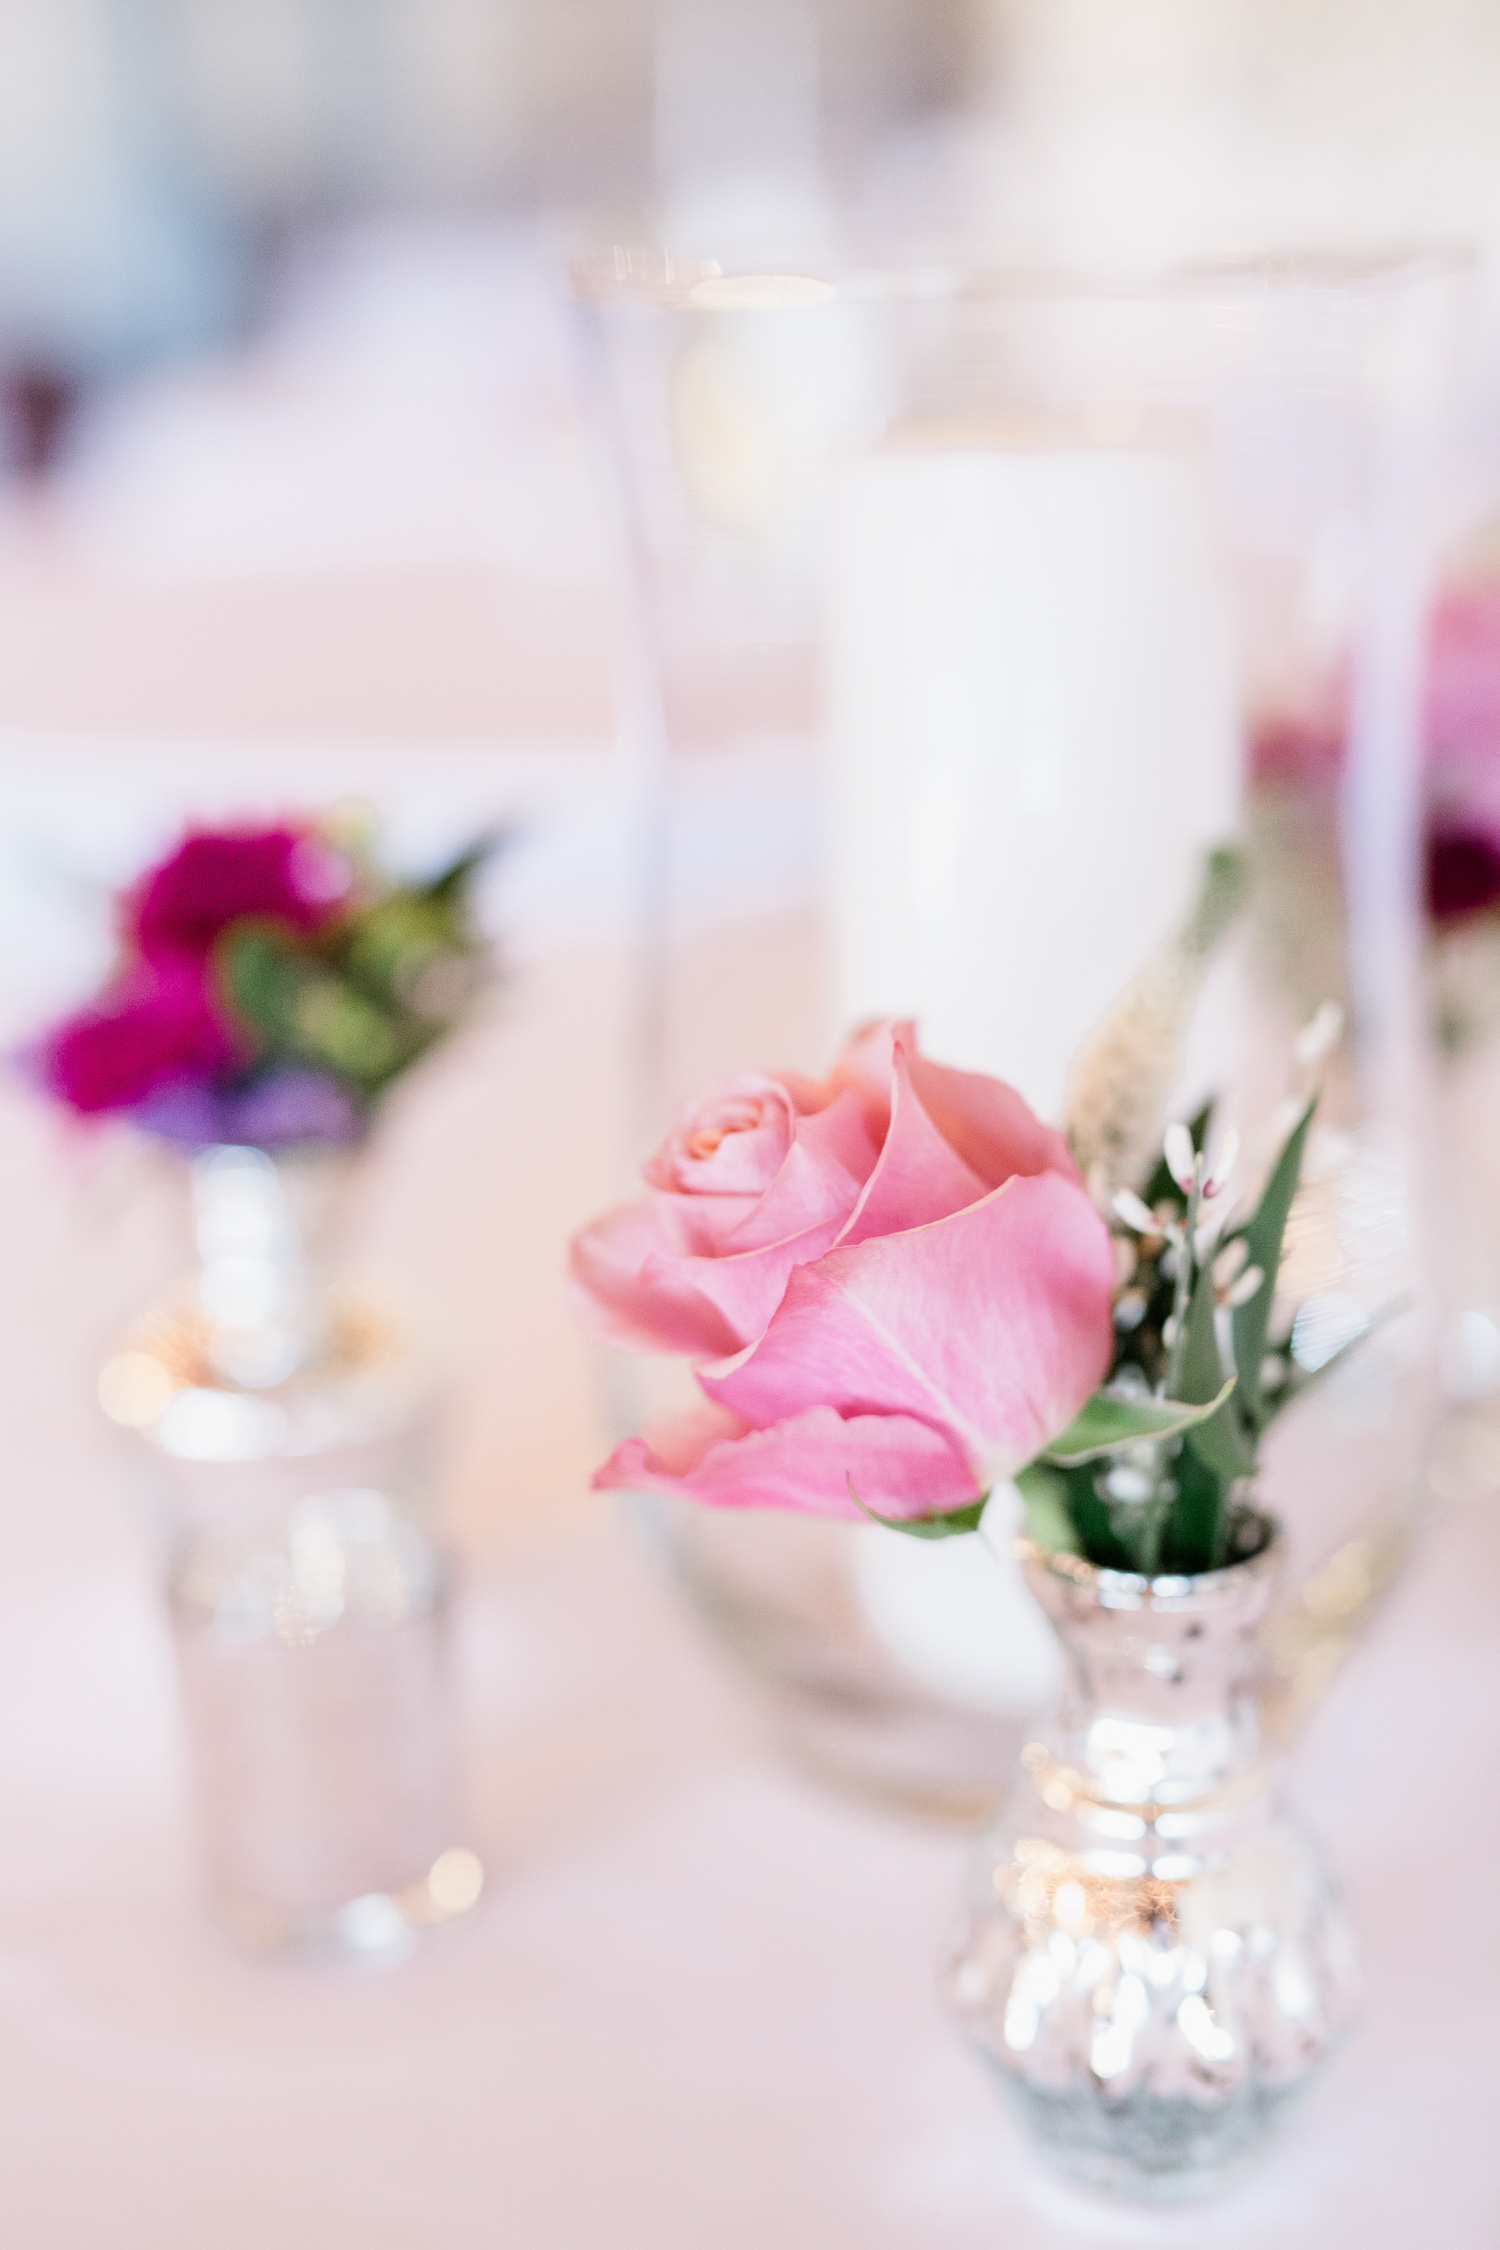 Downtown Knoxville Wedding Venue // Central Avenue Reception // Relix Knoxville Floral Design